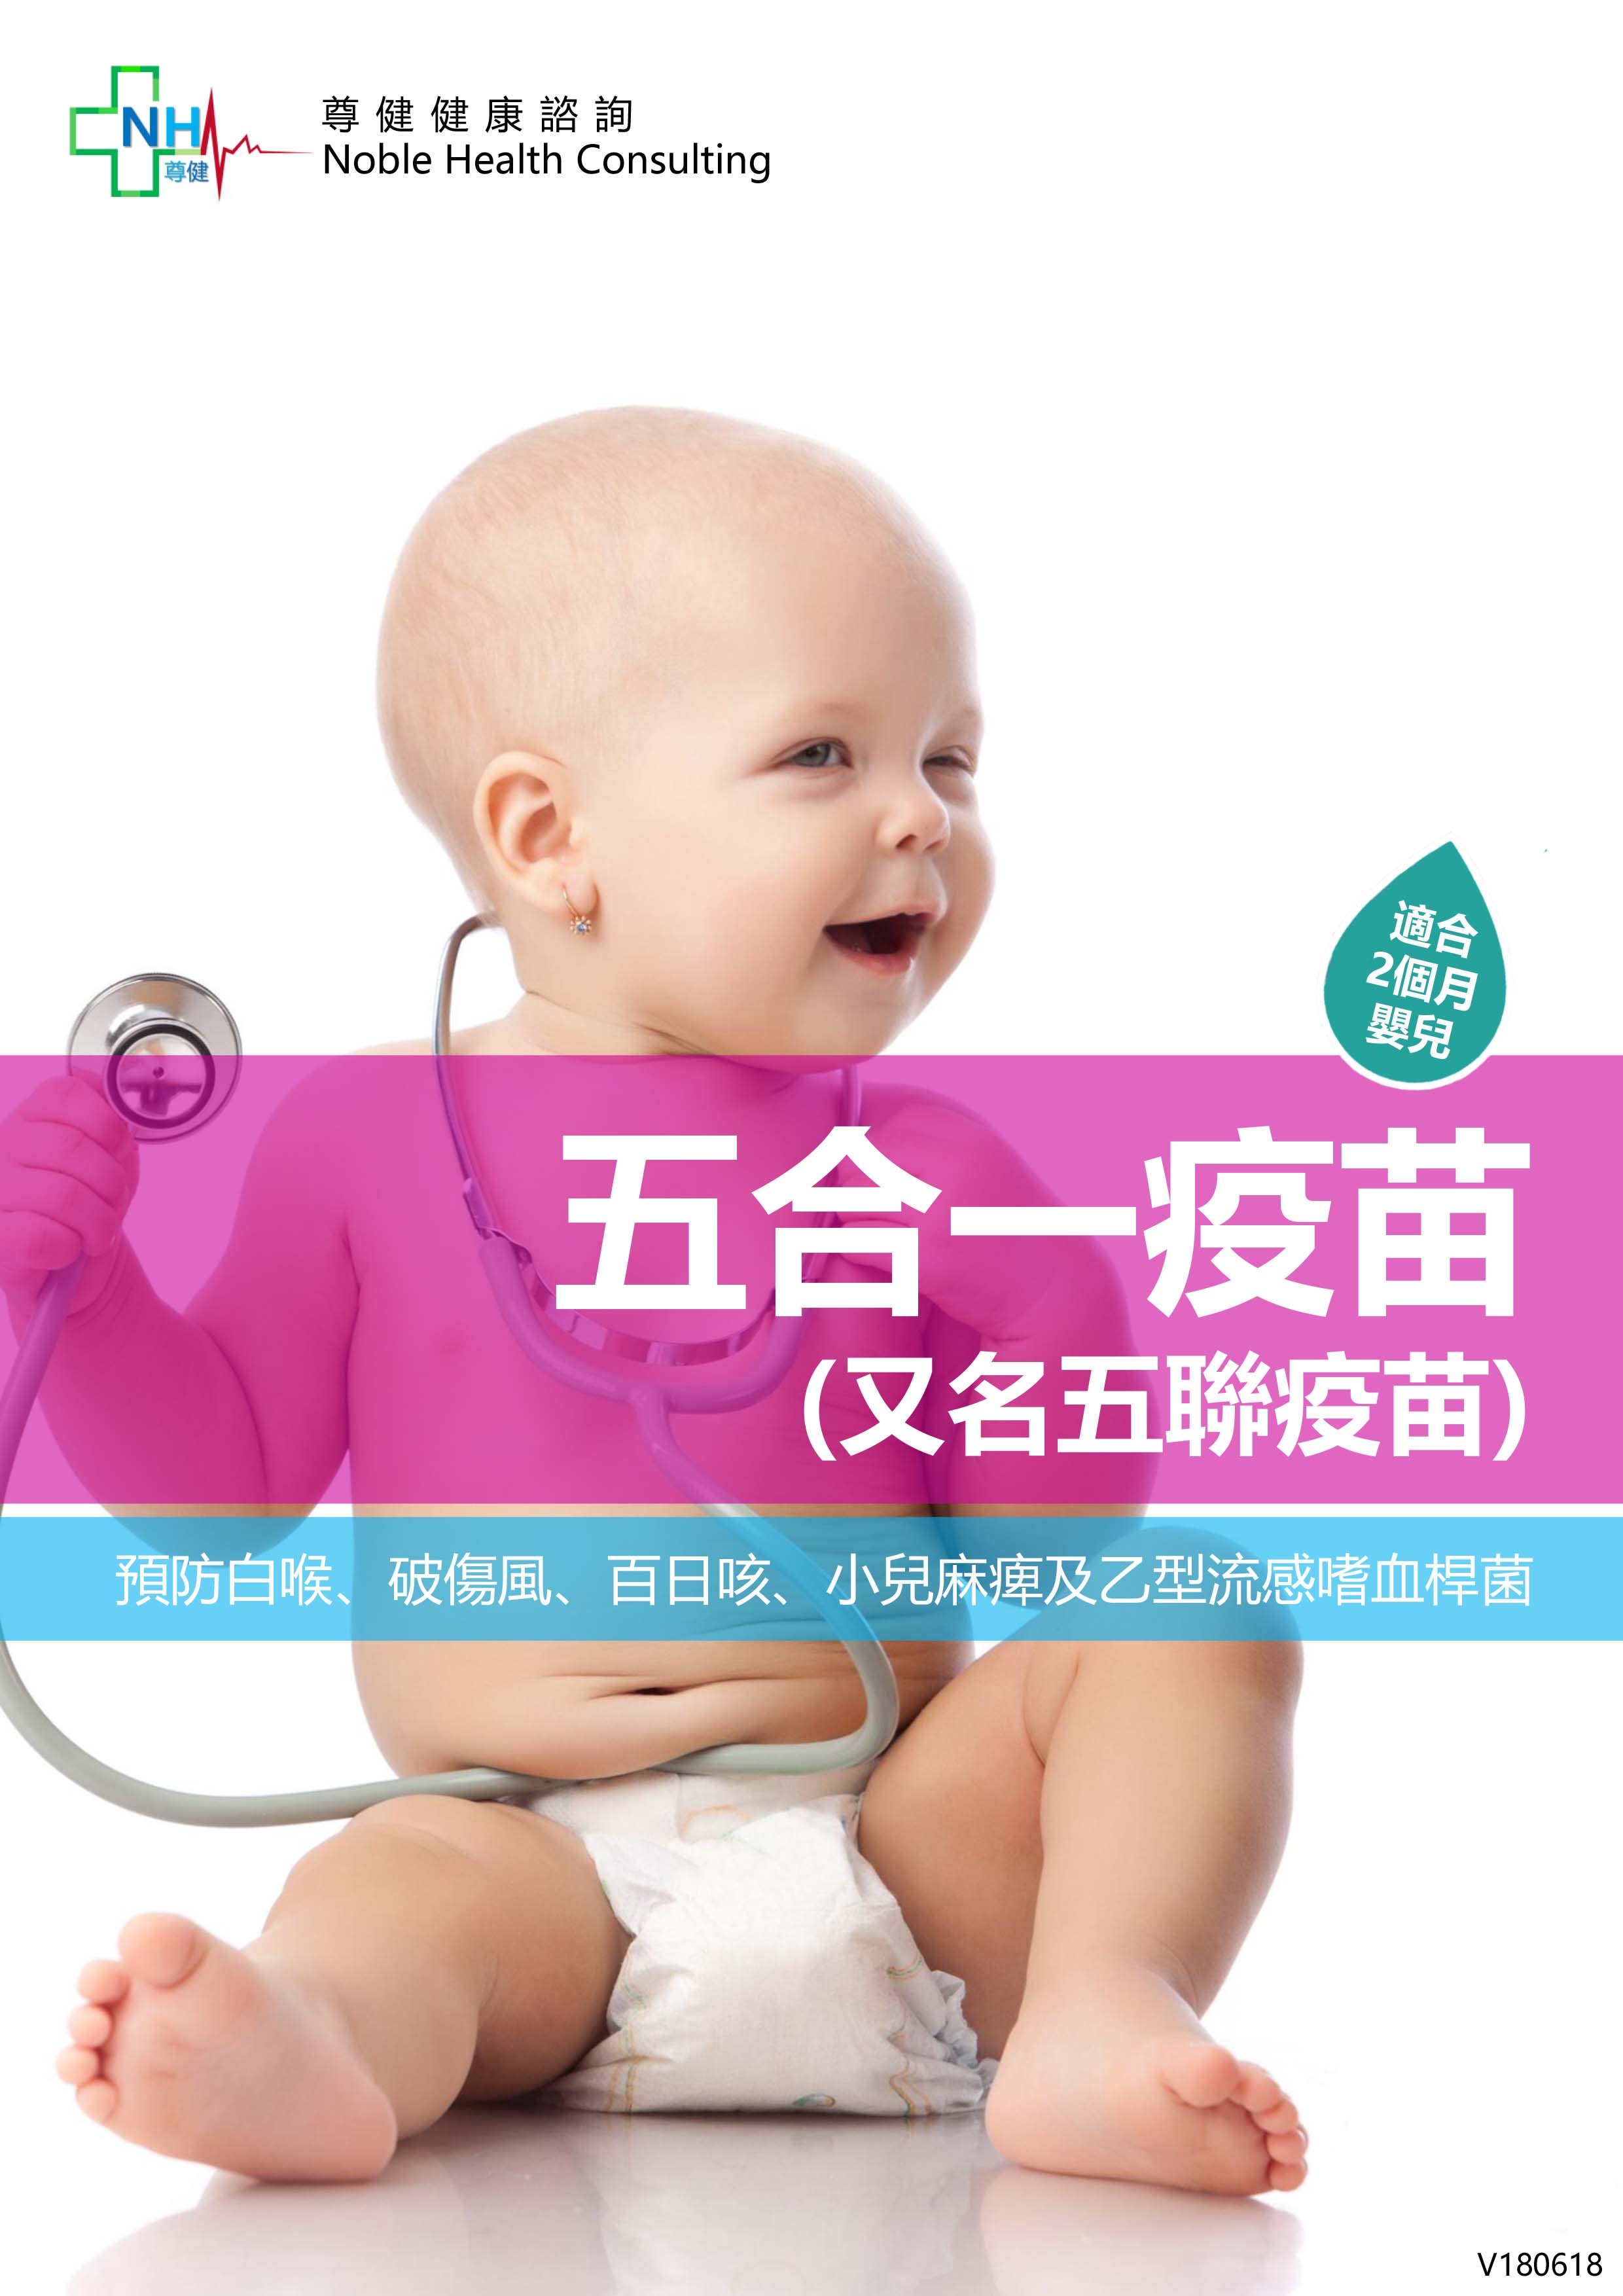 3g-baby-5-in-1-vaccine-1.jpg